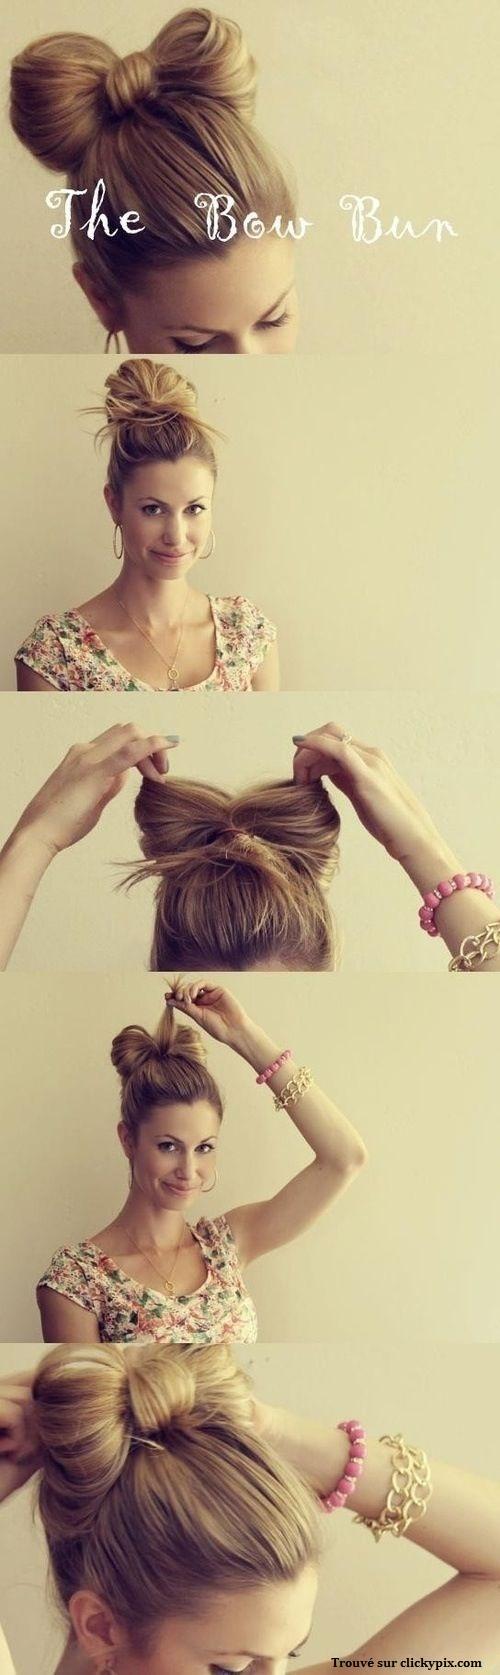 coiffure-printemps-6